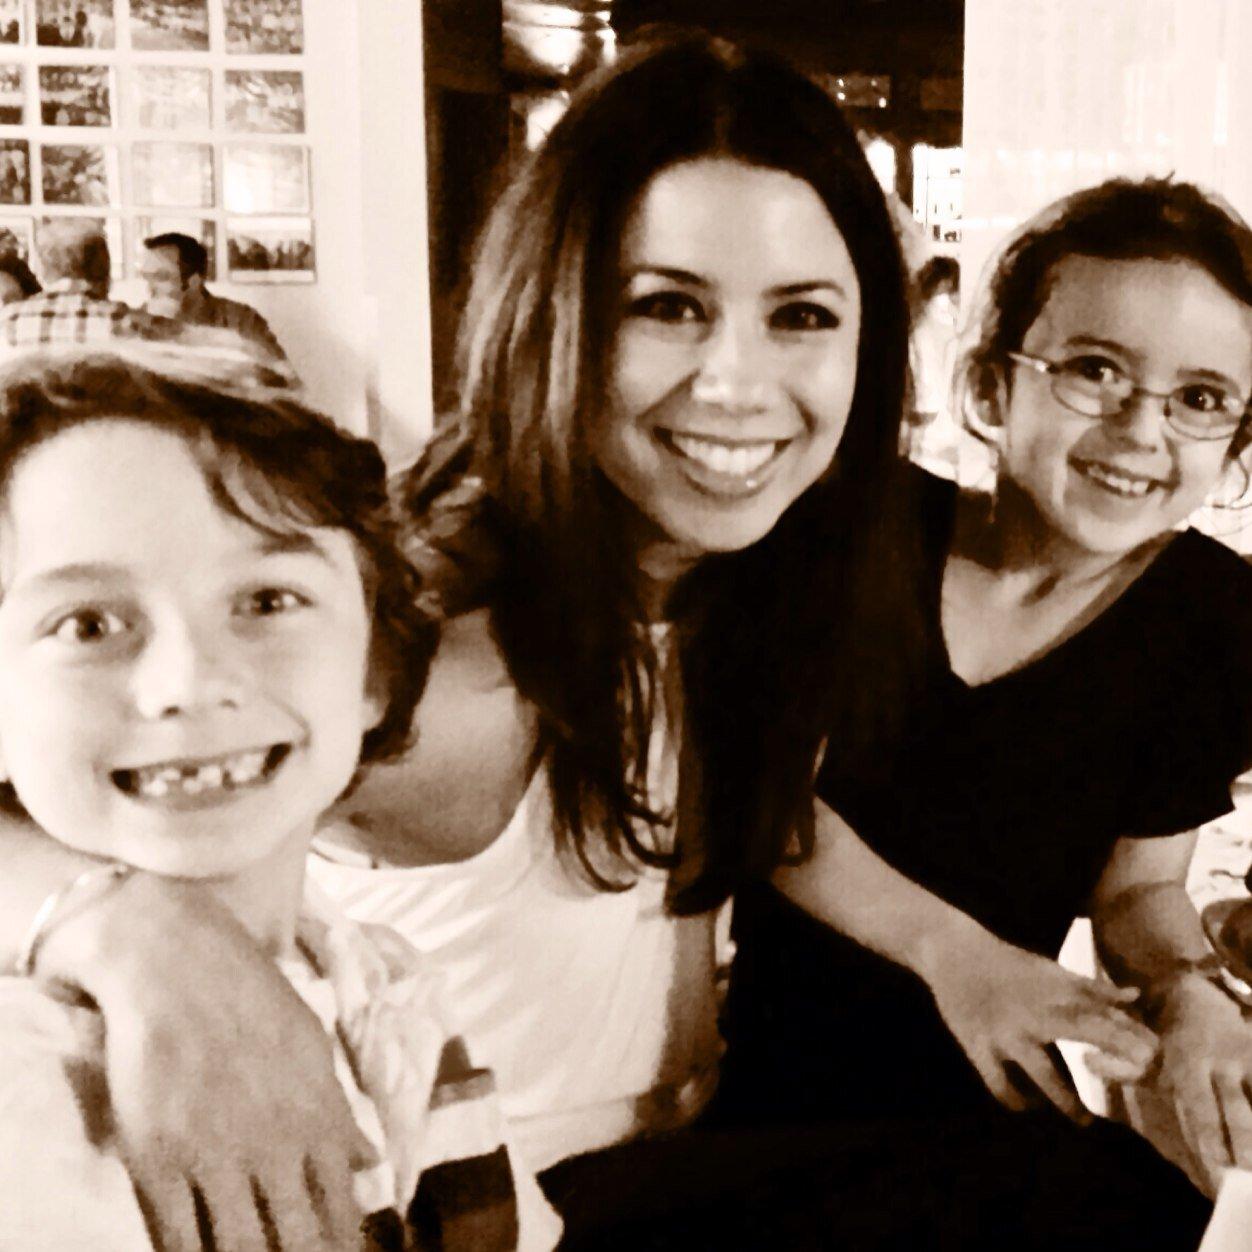 Lois Wilson (actress),Patsy Kensit (born 1968) Hot fotos Eily Malyon,Marisa Del Frate